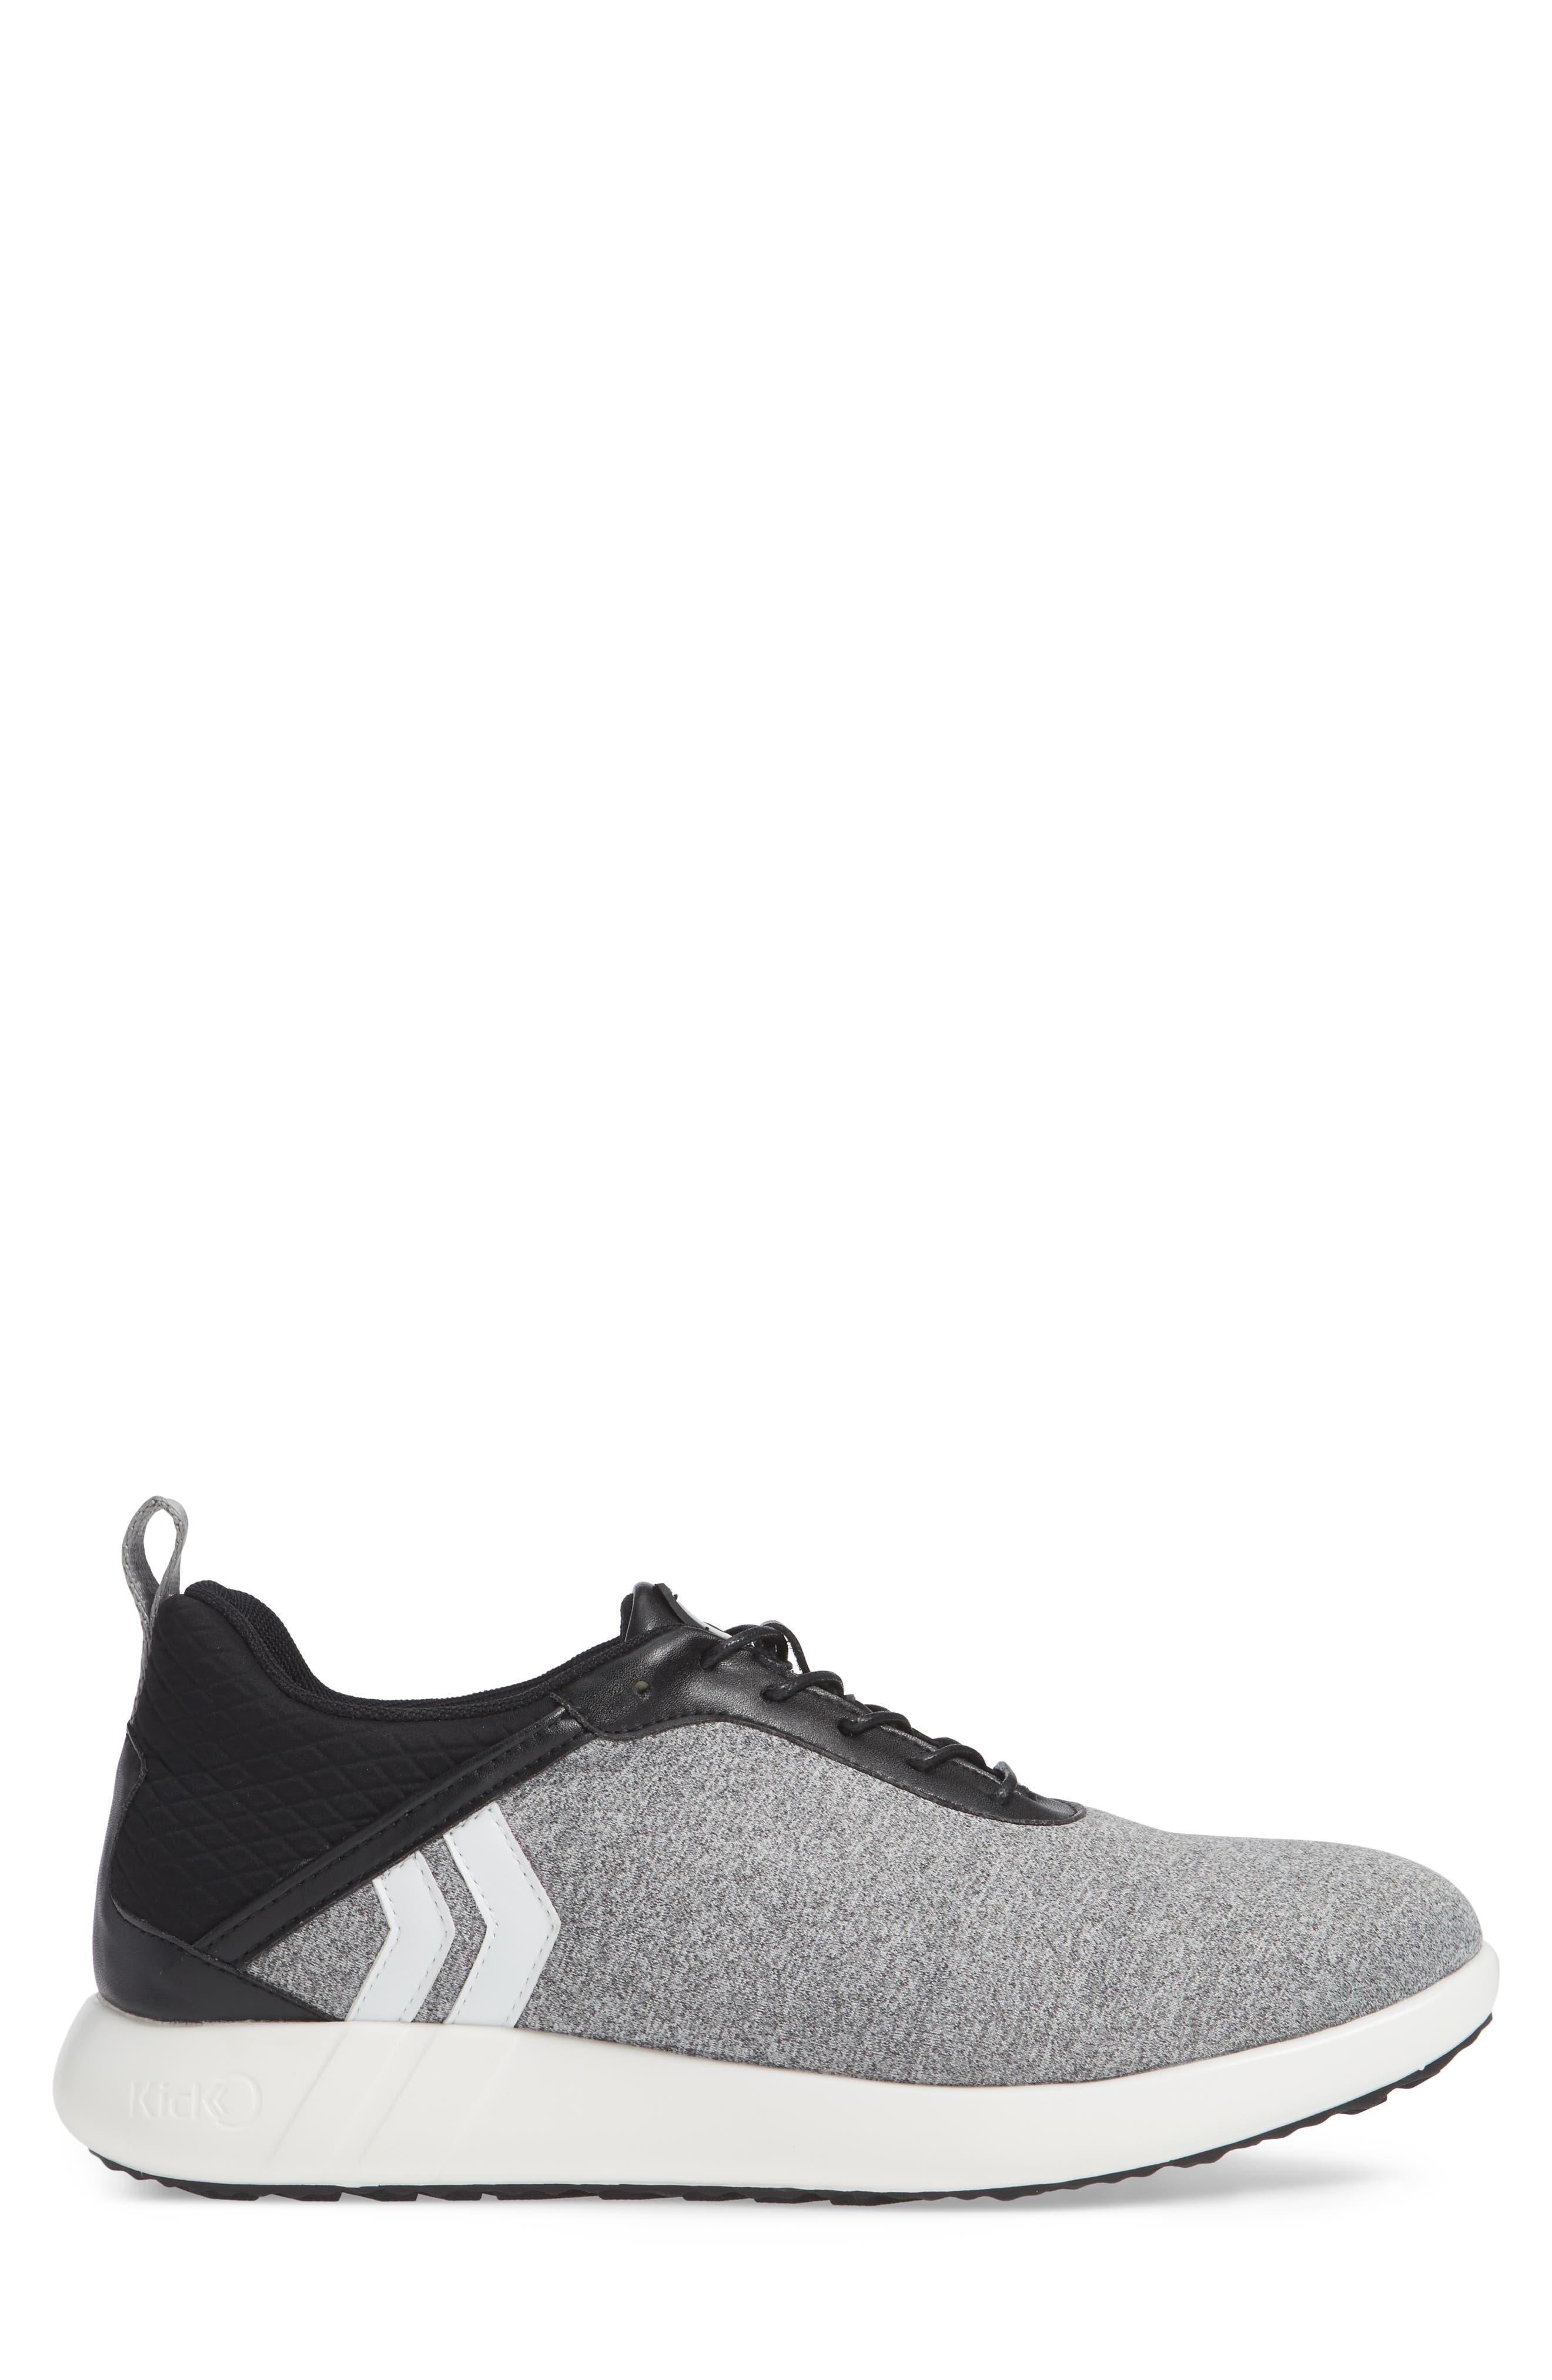 Avalon Sneaker,                             Alternate thumbnail 3, color,                             GREY FABRIC